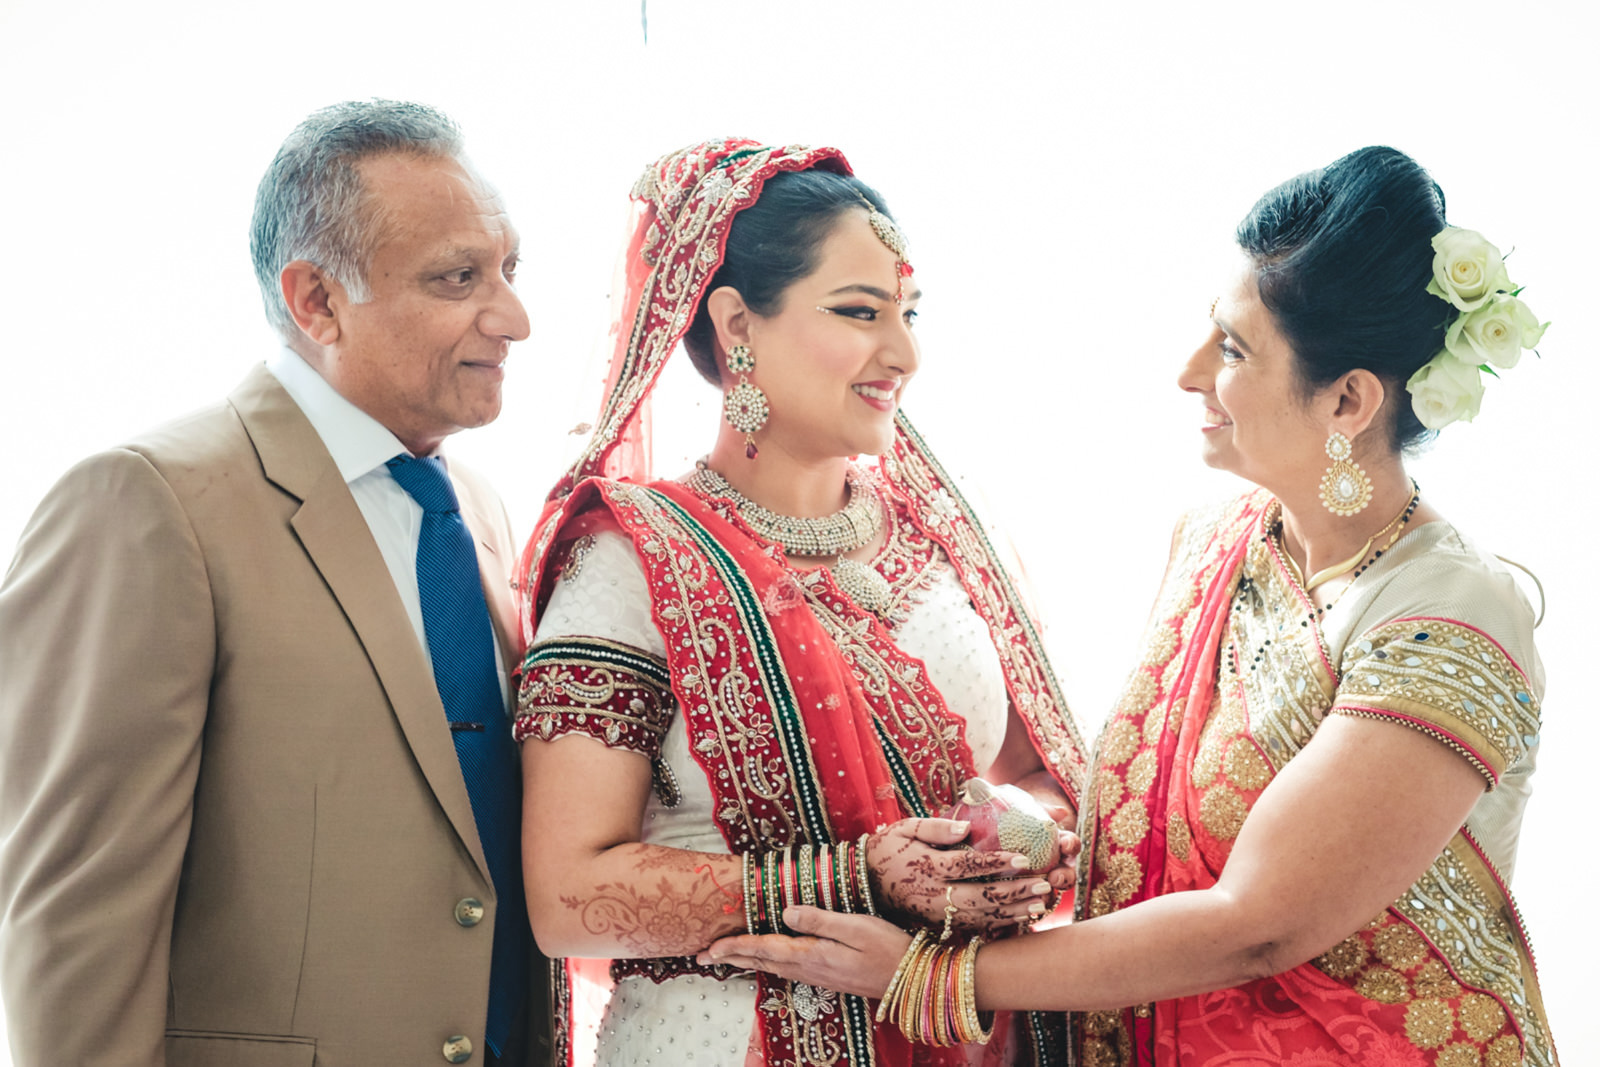 umhlanga westville wedding photography rbadal bride family portrait